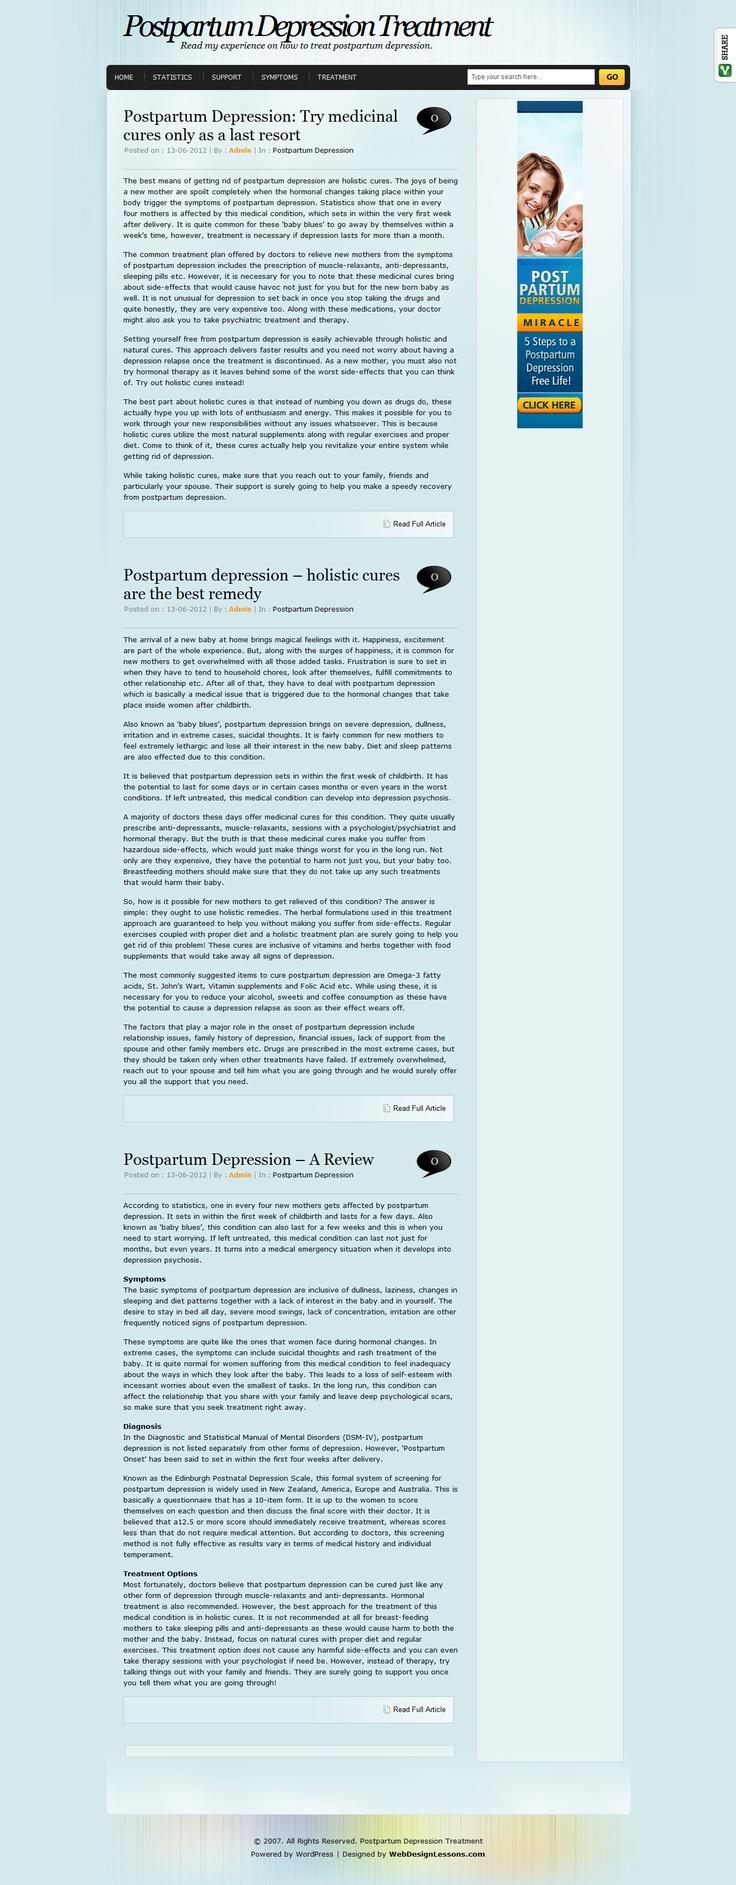 cover letter portfolio management essay discipline student